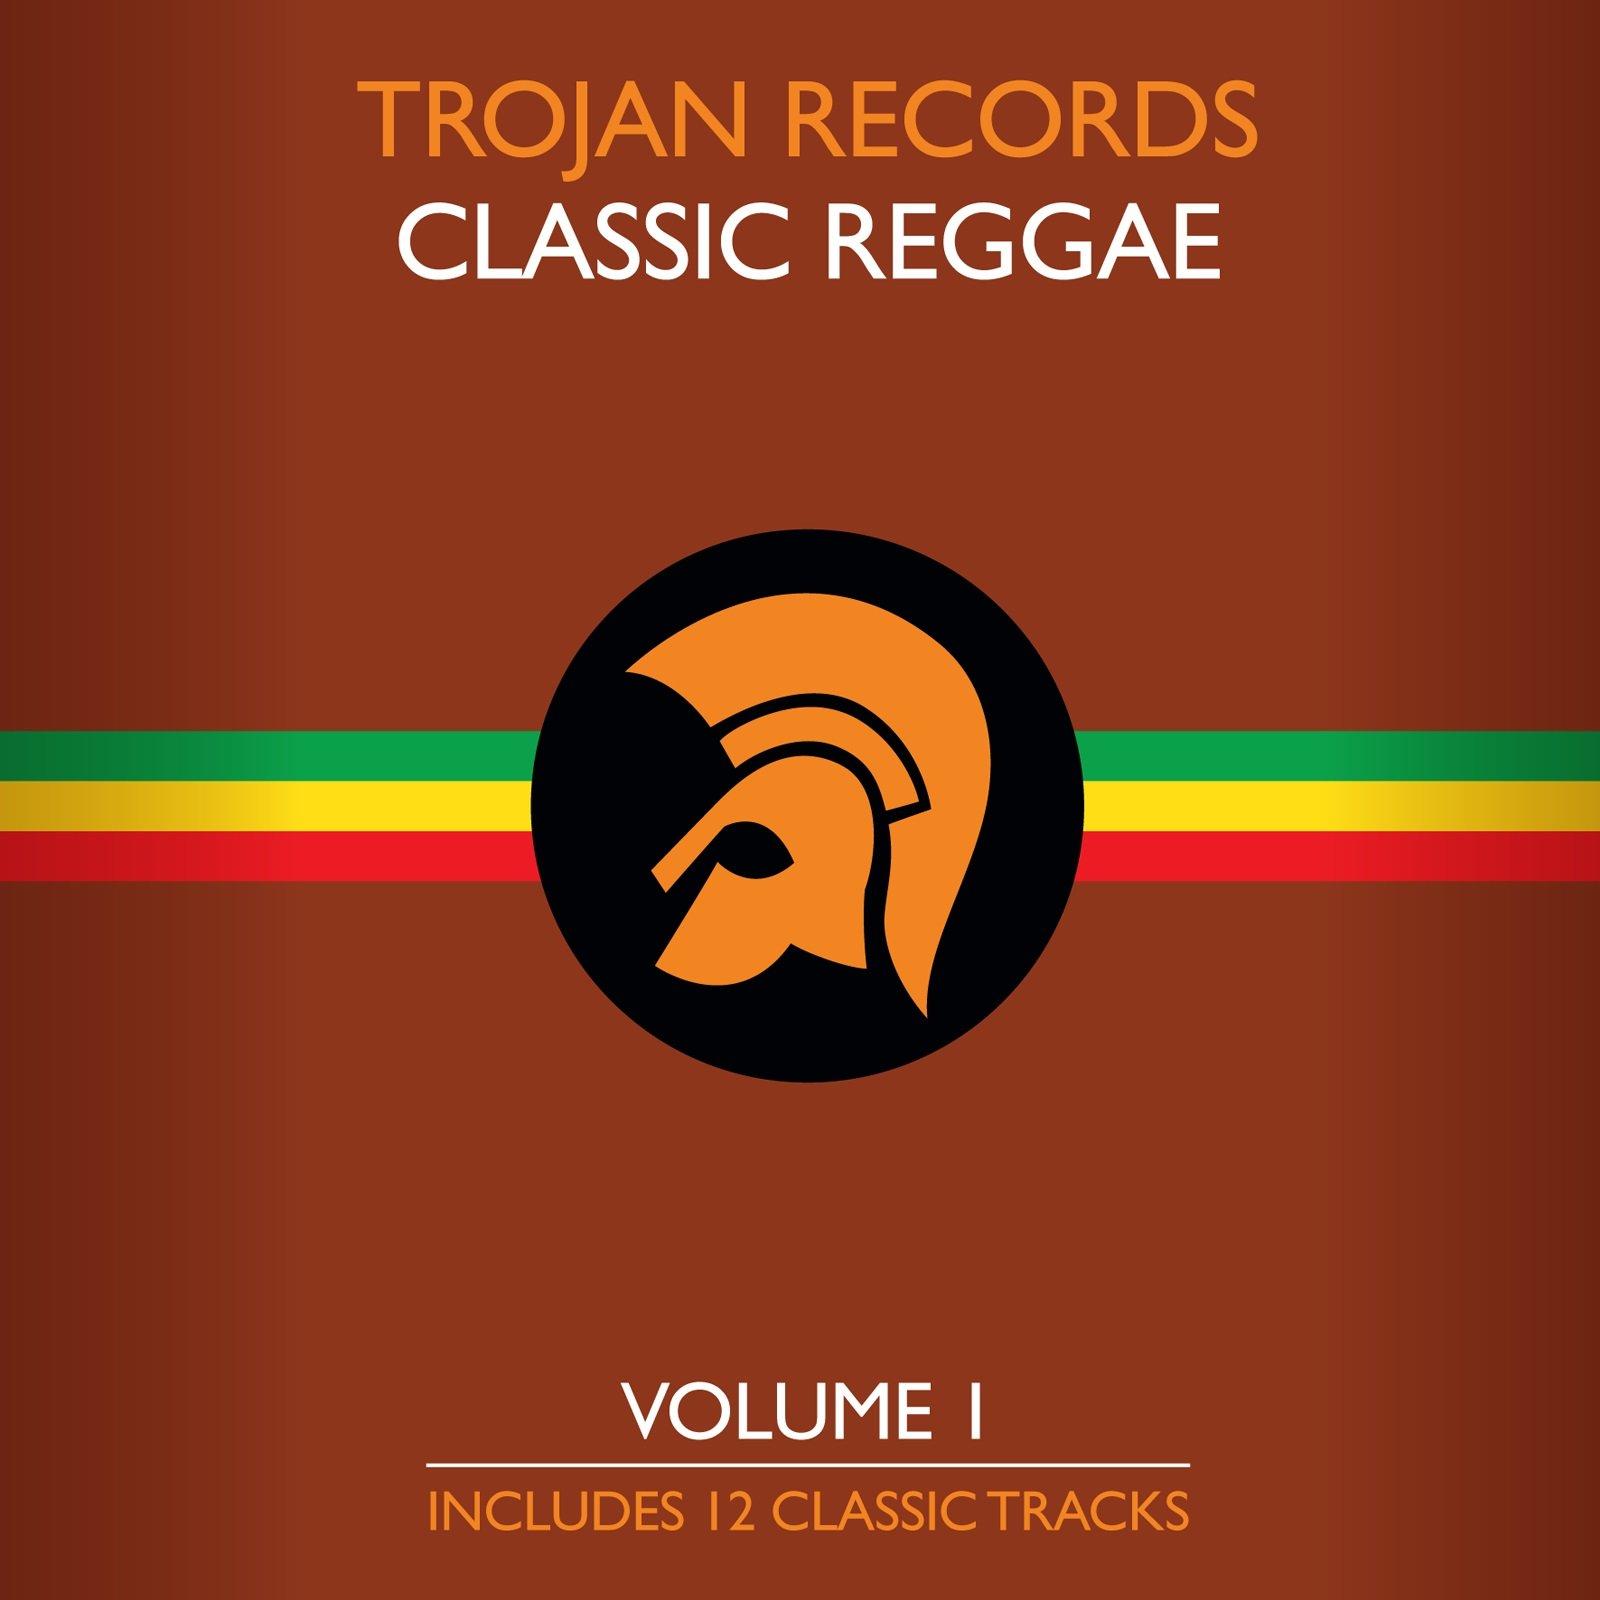 Vinilo : TROJAN RECORDS - Best Of Classic Reggae 1 (LP Vinyl)